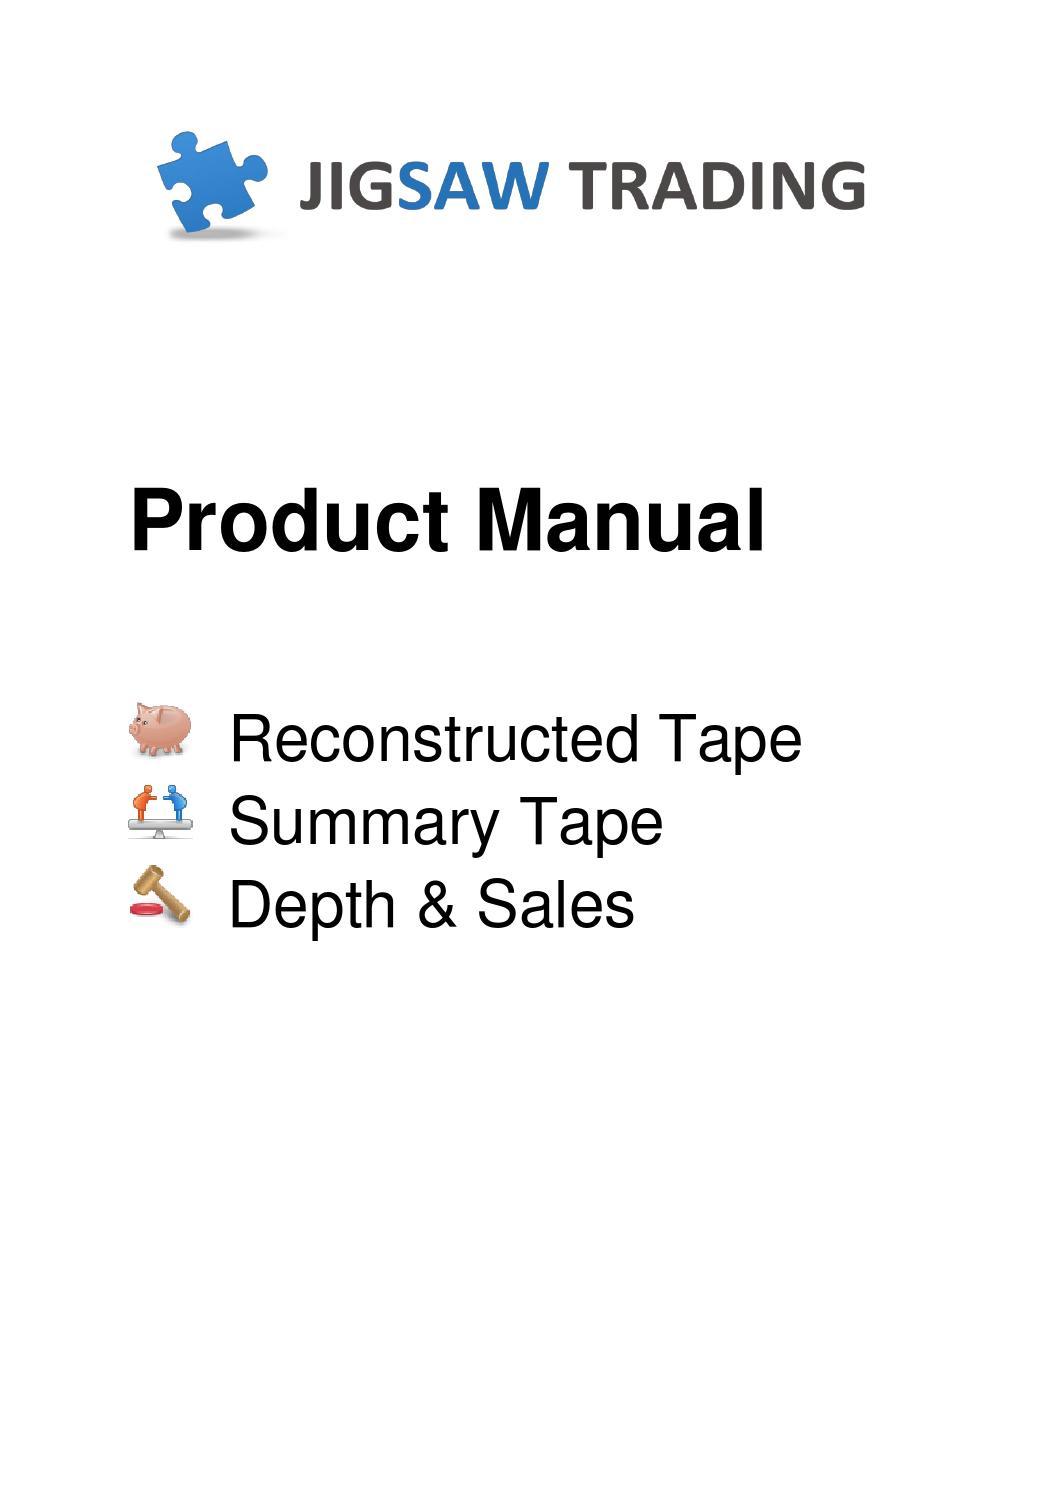 Jigsaw product manual v5 2 9 6 by JiggyDave - issuu